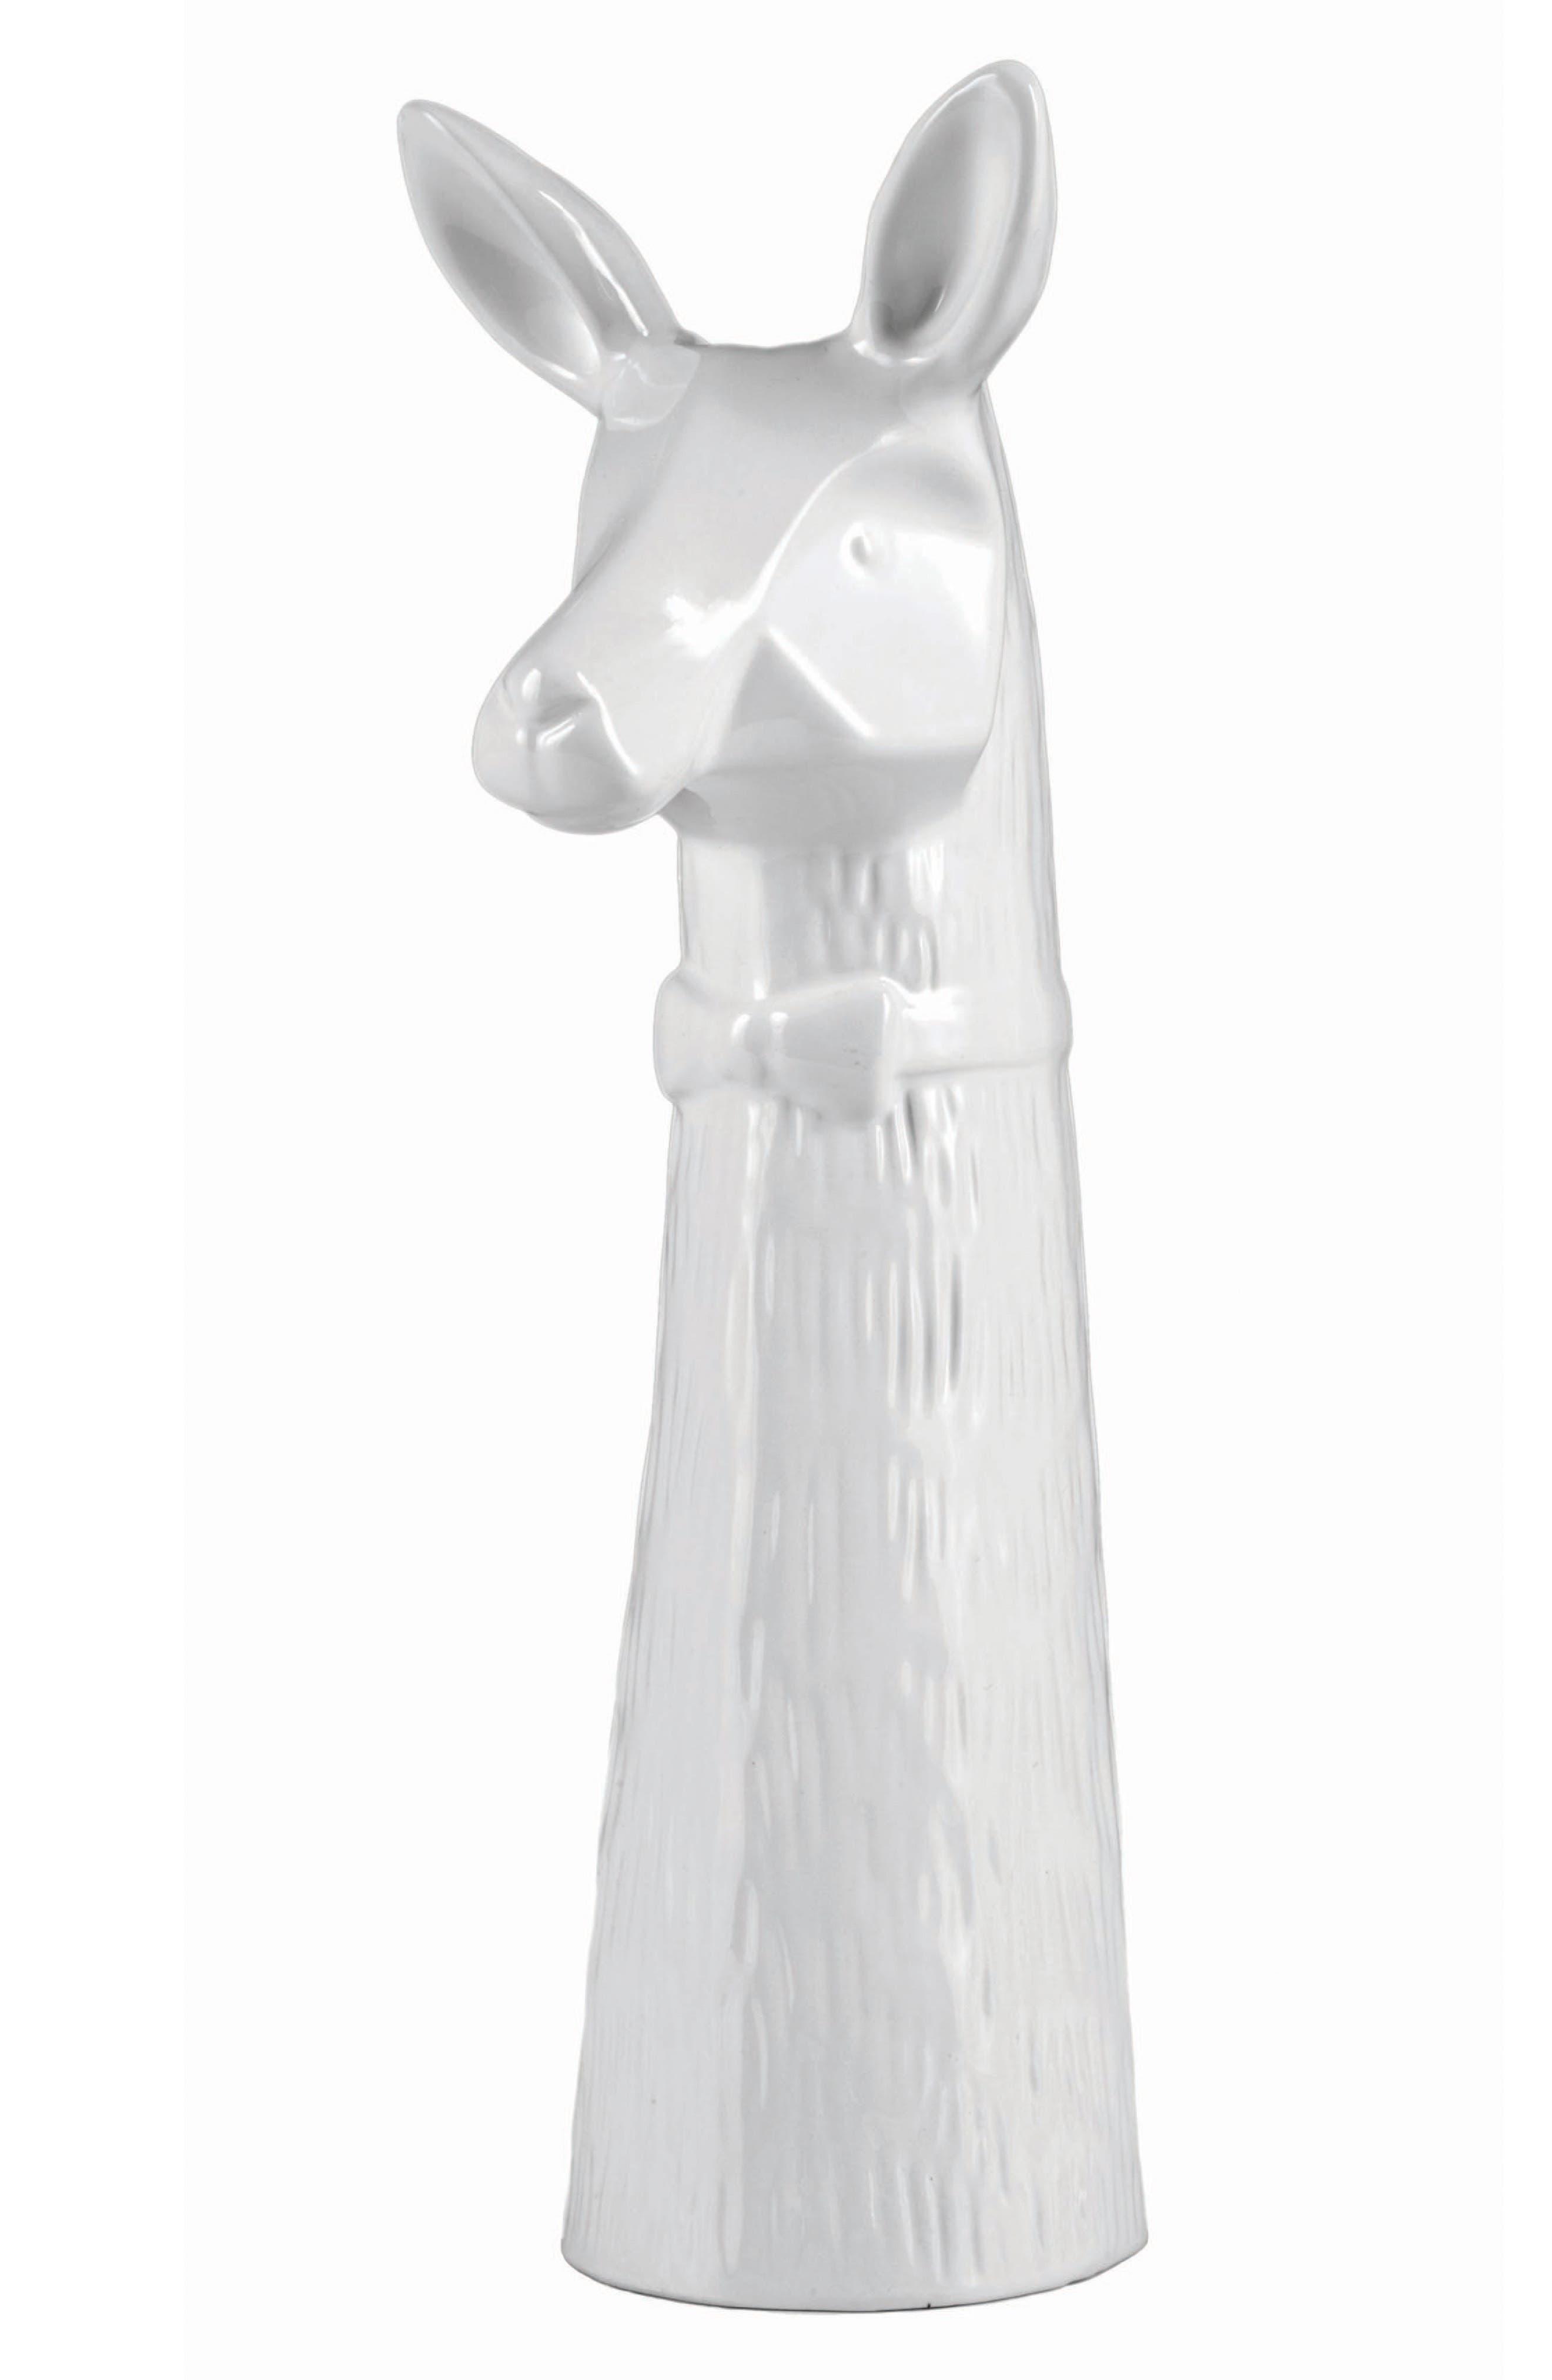 Easy, Tiger Llama Ceramic Bud Vase